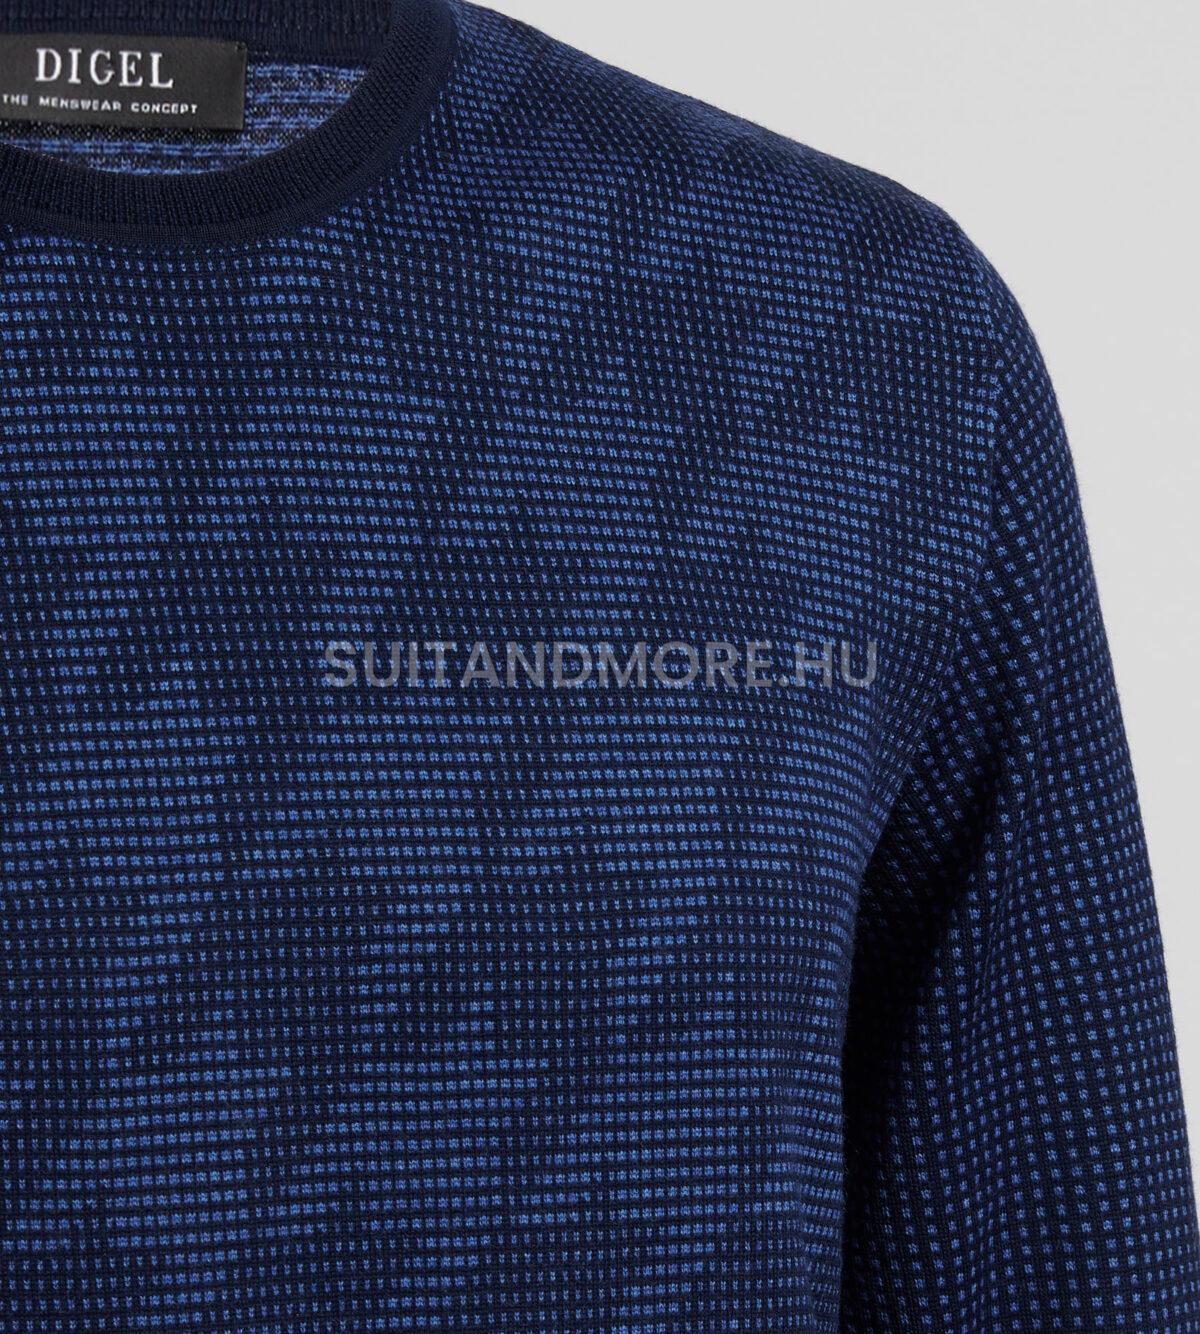 digel-sotetkek-modern-fit-kerek-nyaku-tyuklabmintas-gyapju-pulover-faros1-1-1288010-20-02